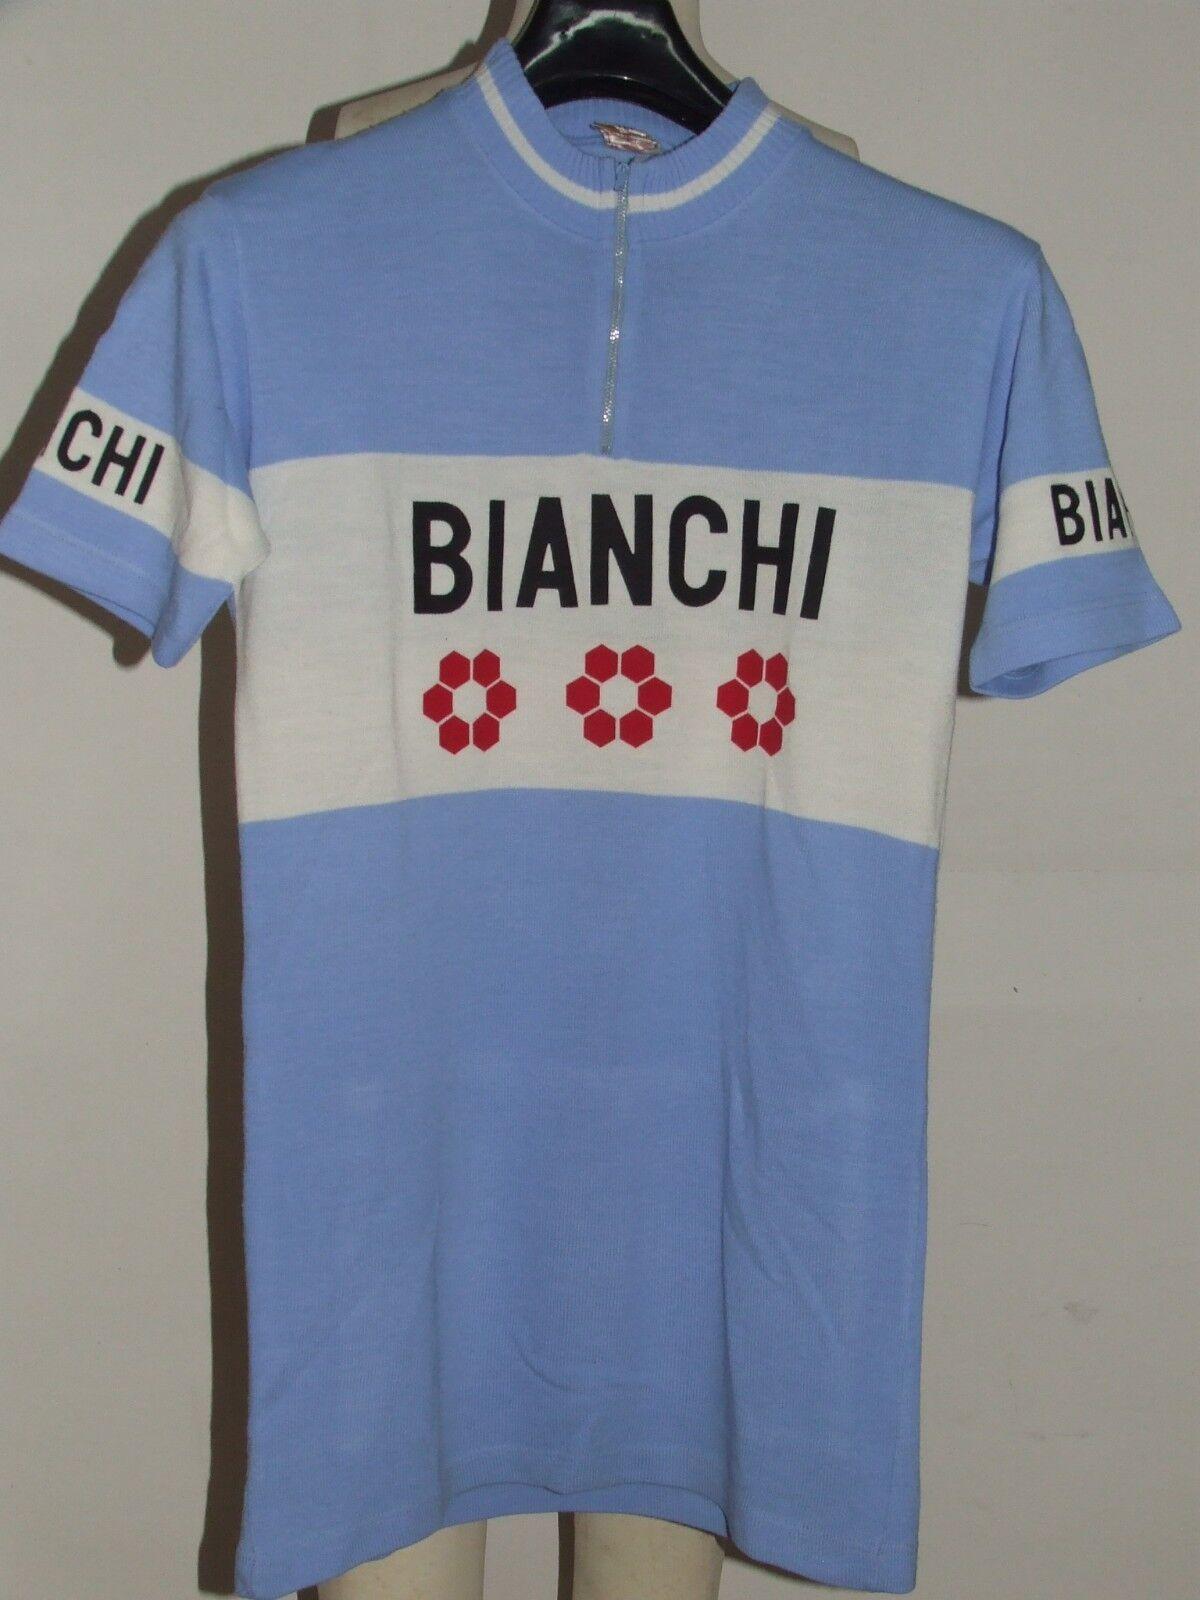 MAGLIA BICI SHIRT SHIRT BICI CICLISMO EROICA VINTAGE 70'S BIANCHI magl. REGINA ACRILICO 298185